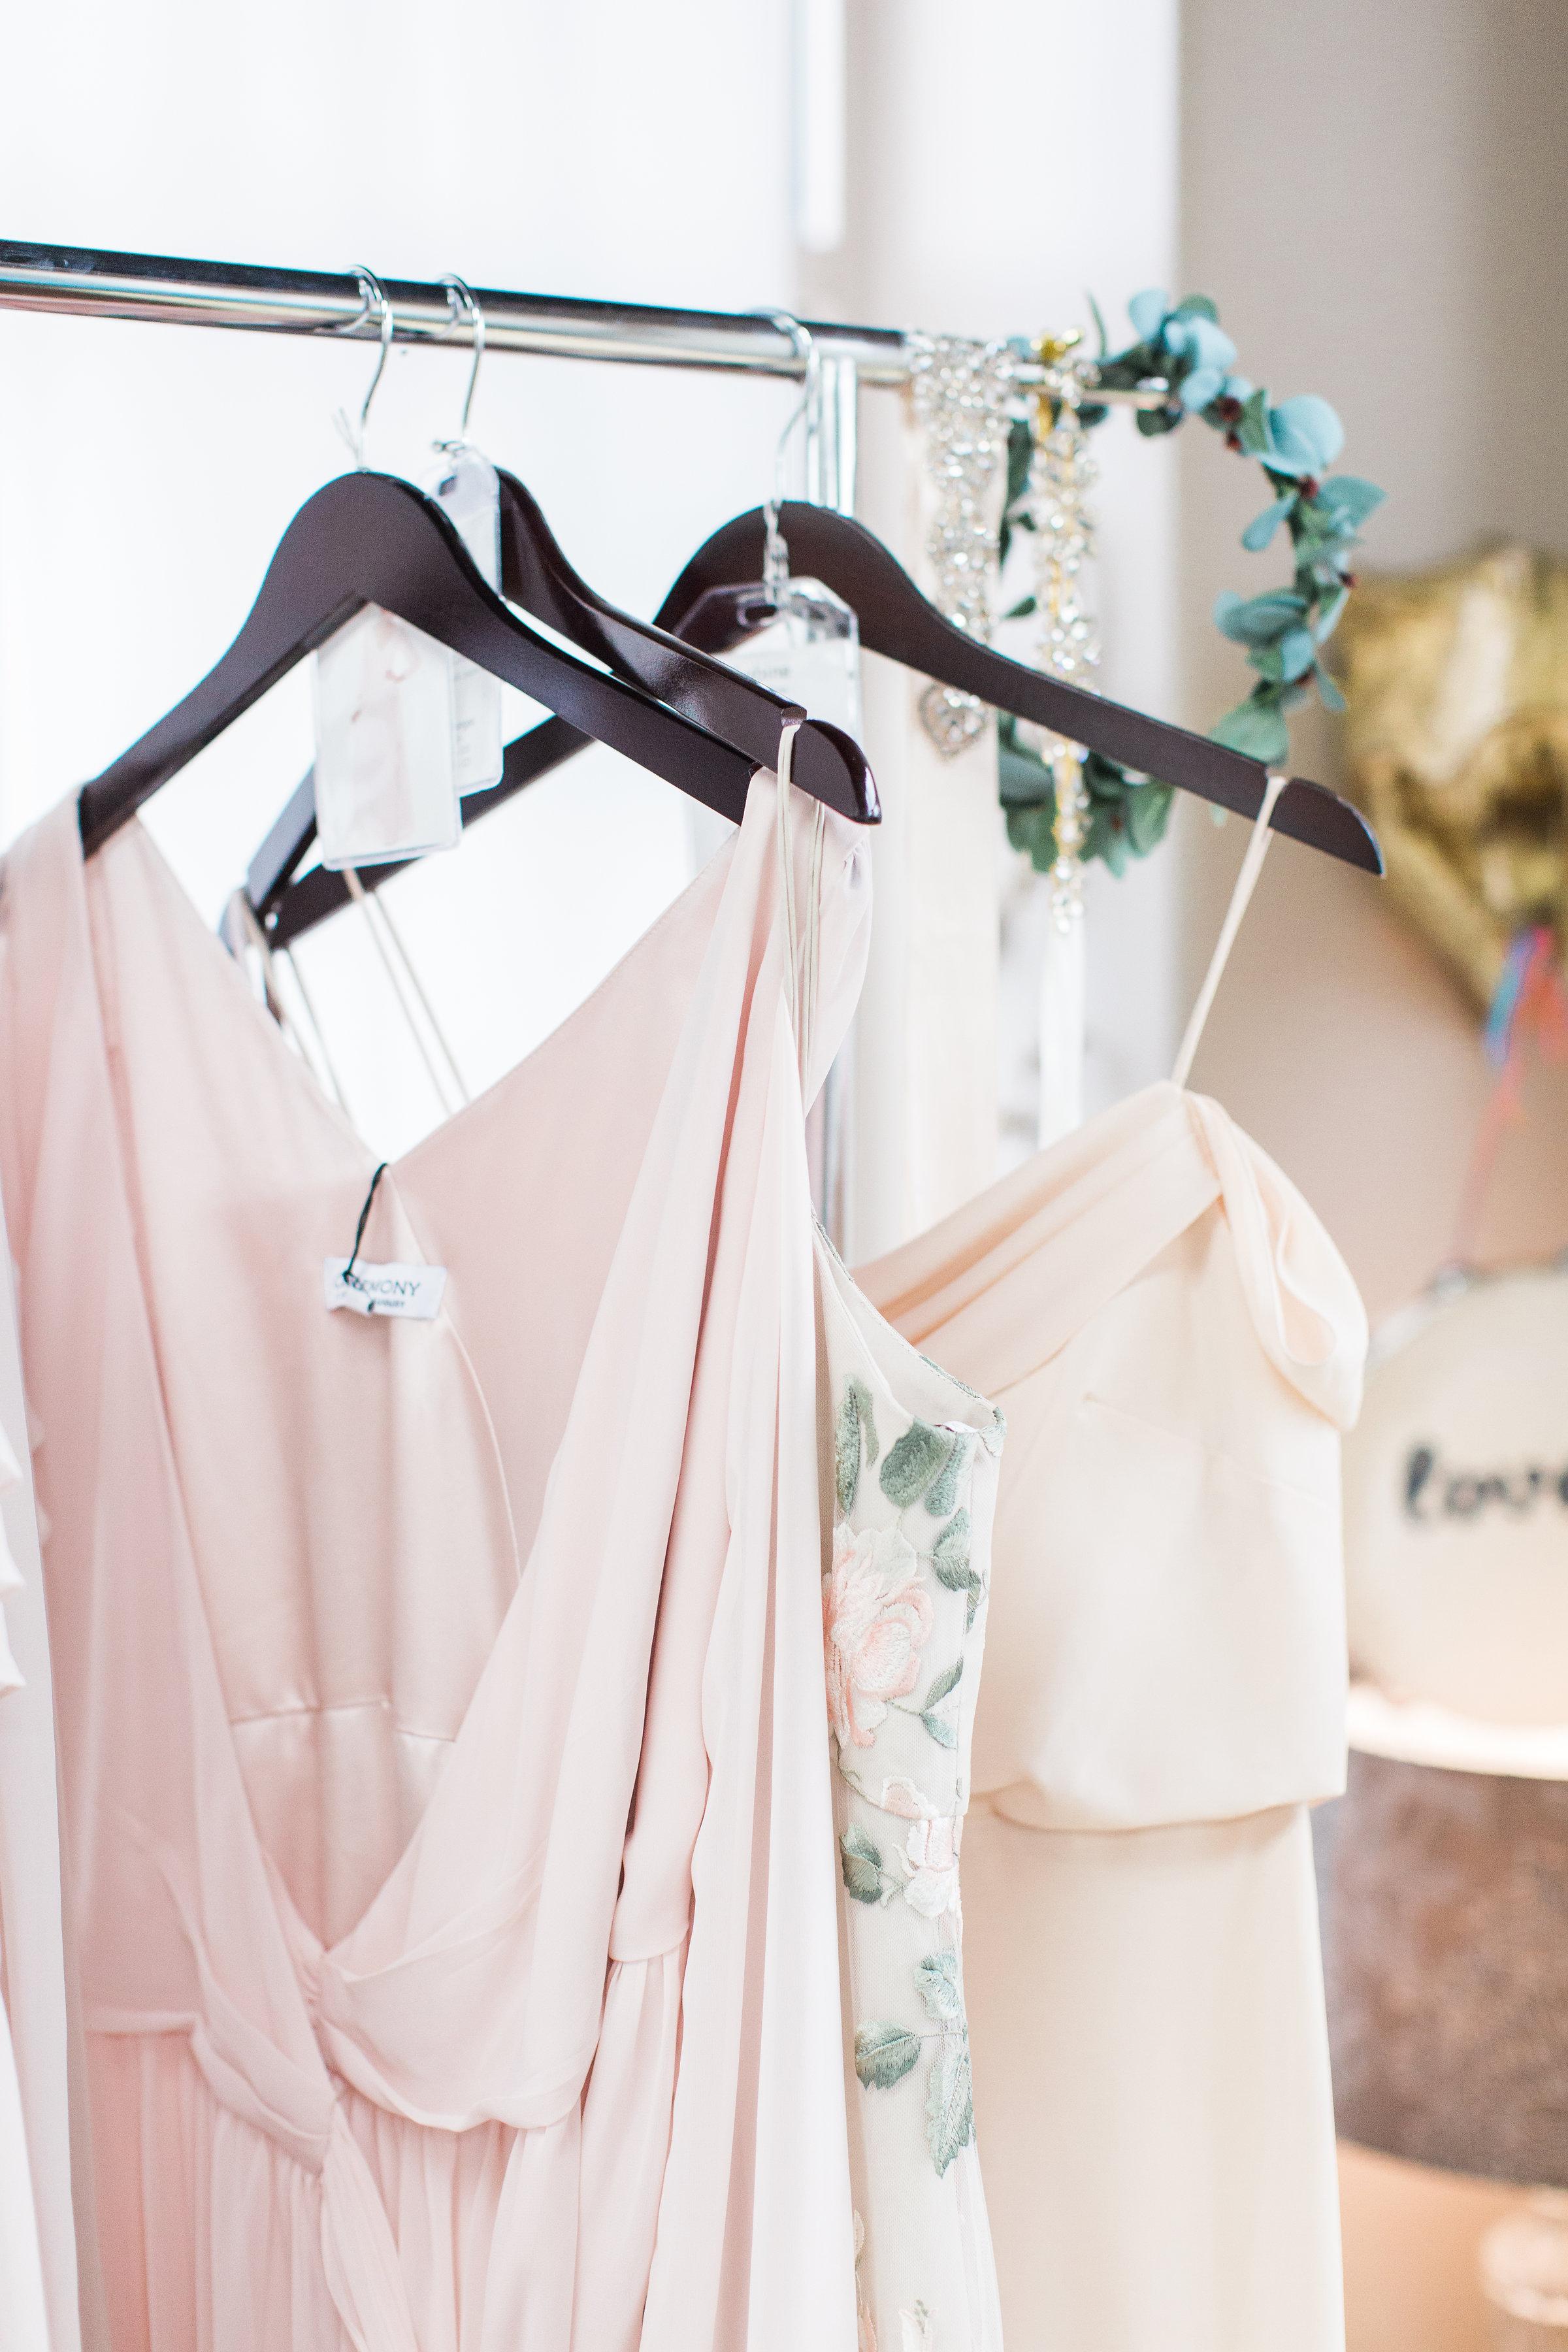 savannah-bridal-boutique-ivory-and-beau-savannah-bride-savannah-bridal-shop-wedding-dress-savannah-weddings-wedding-dress-savannah-aptbphotography-aptbphoto-veils-tiaras-bridal-jewelery-bridesmaids-dresses-bridesmaids-gowns-savannah-bridesmaids-9191.jpg